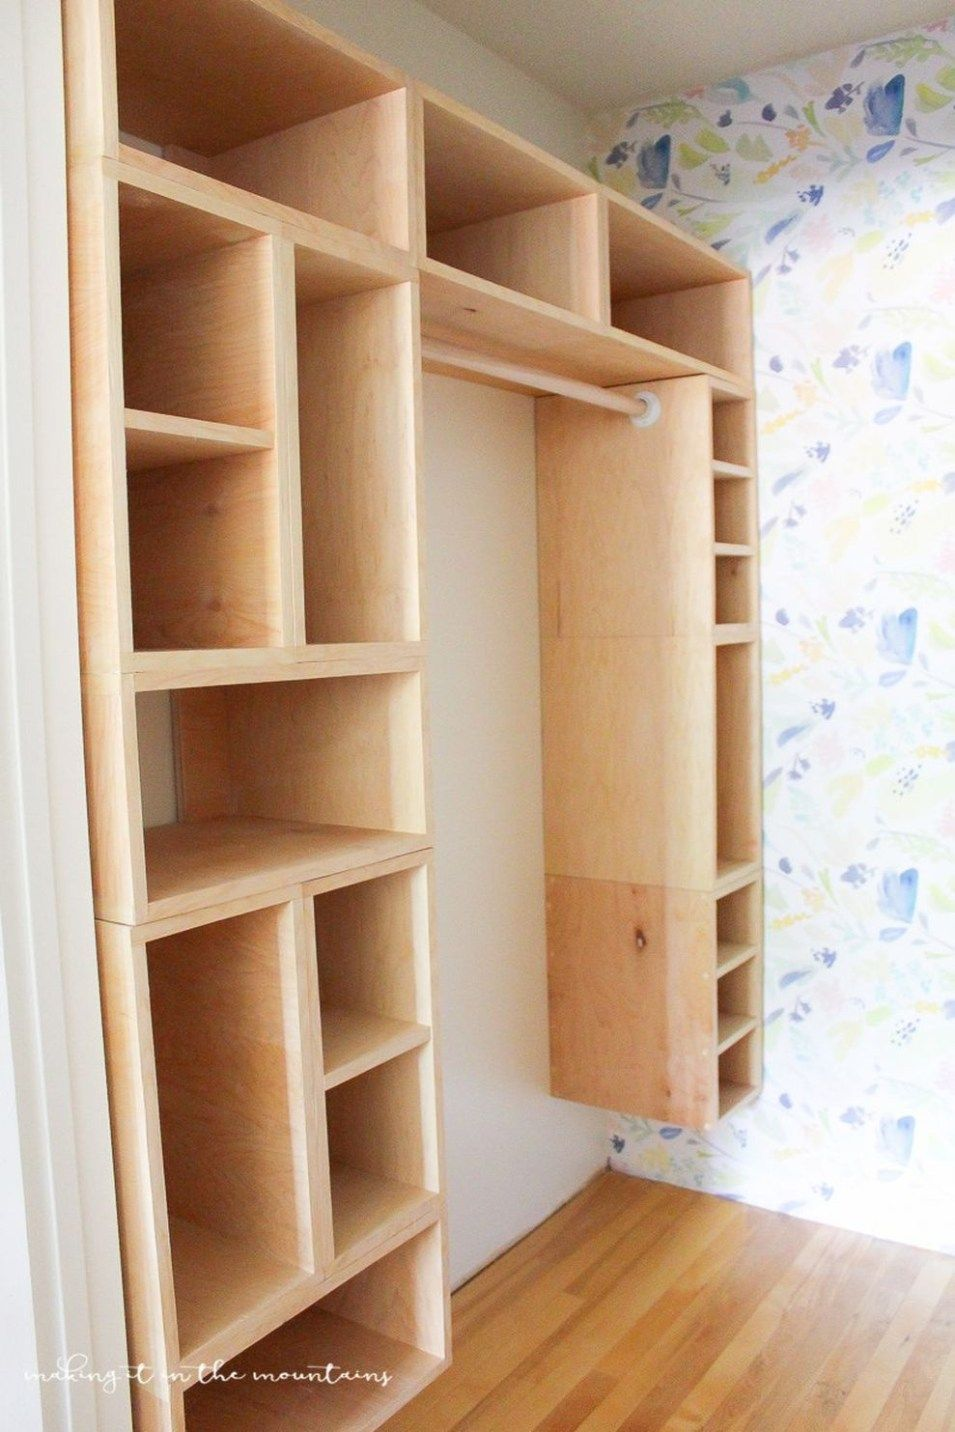 71 easy and affordable diy wood closet shelves ideas diy